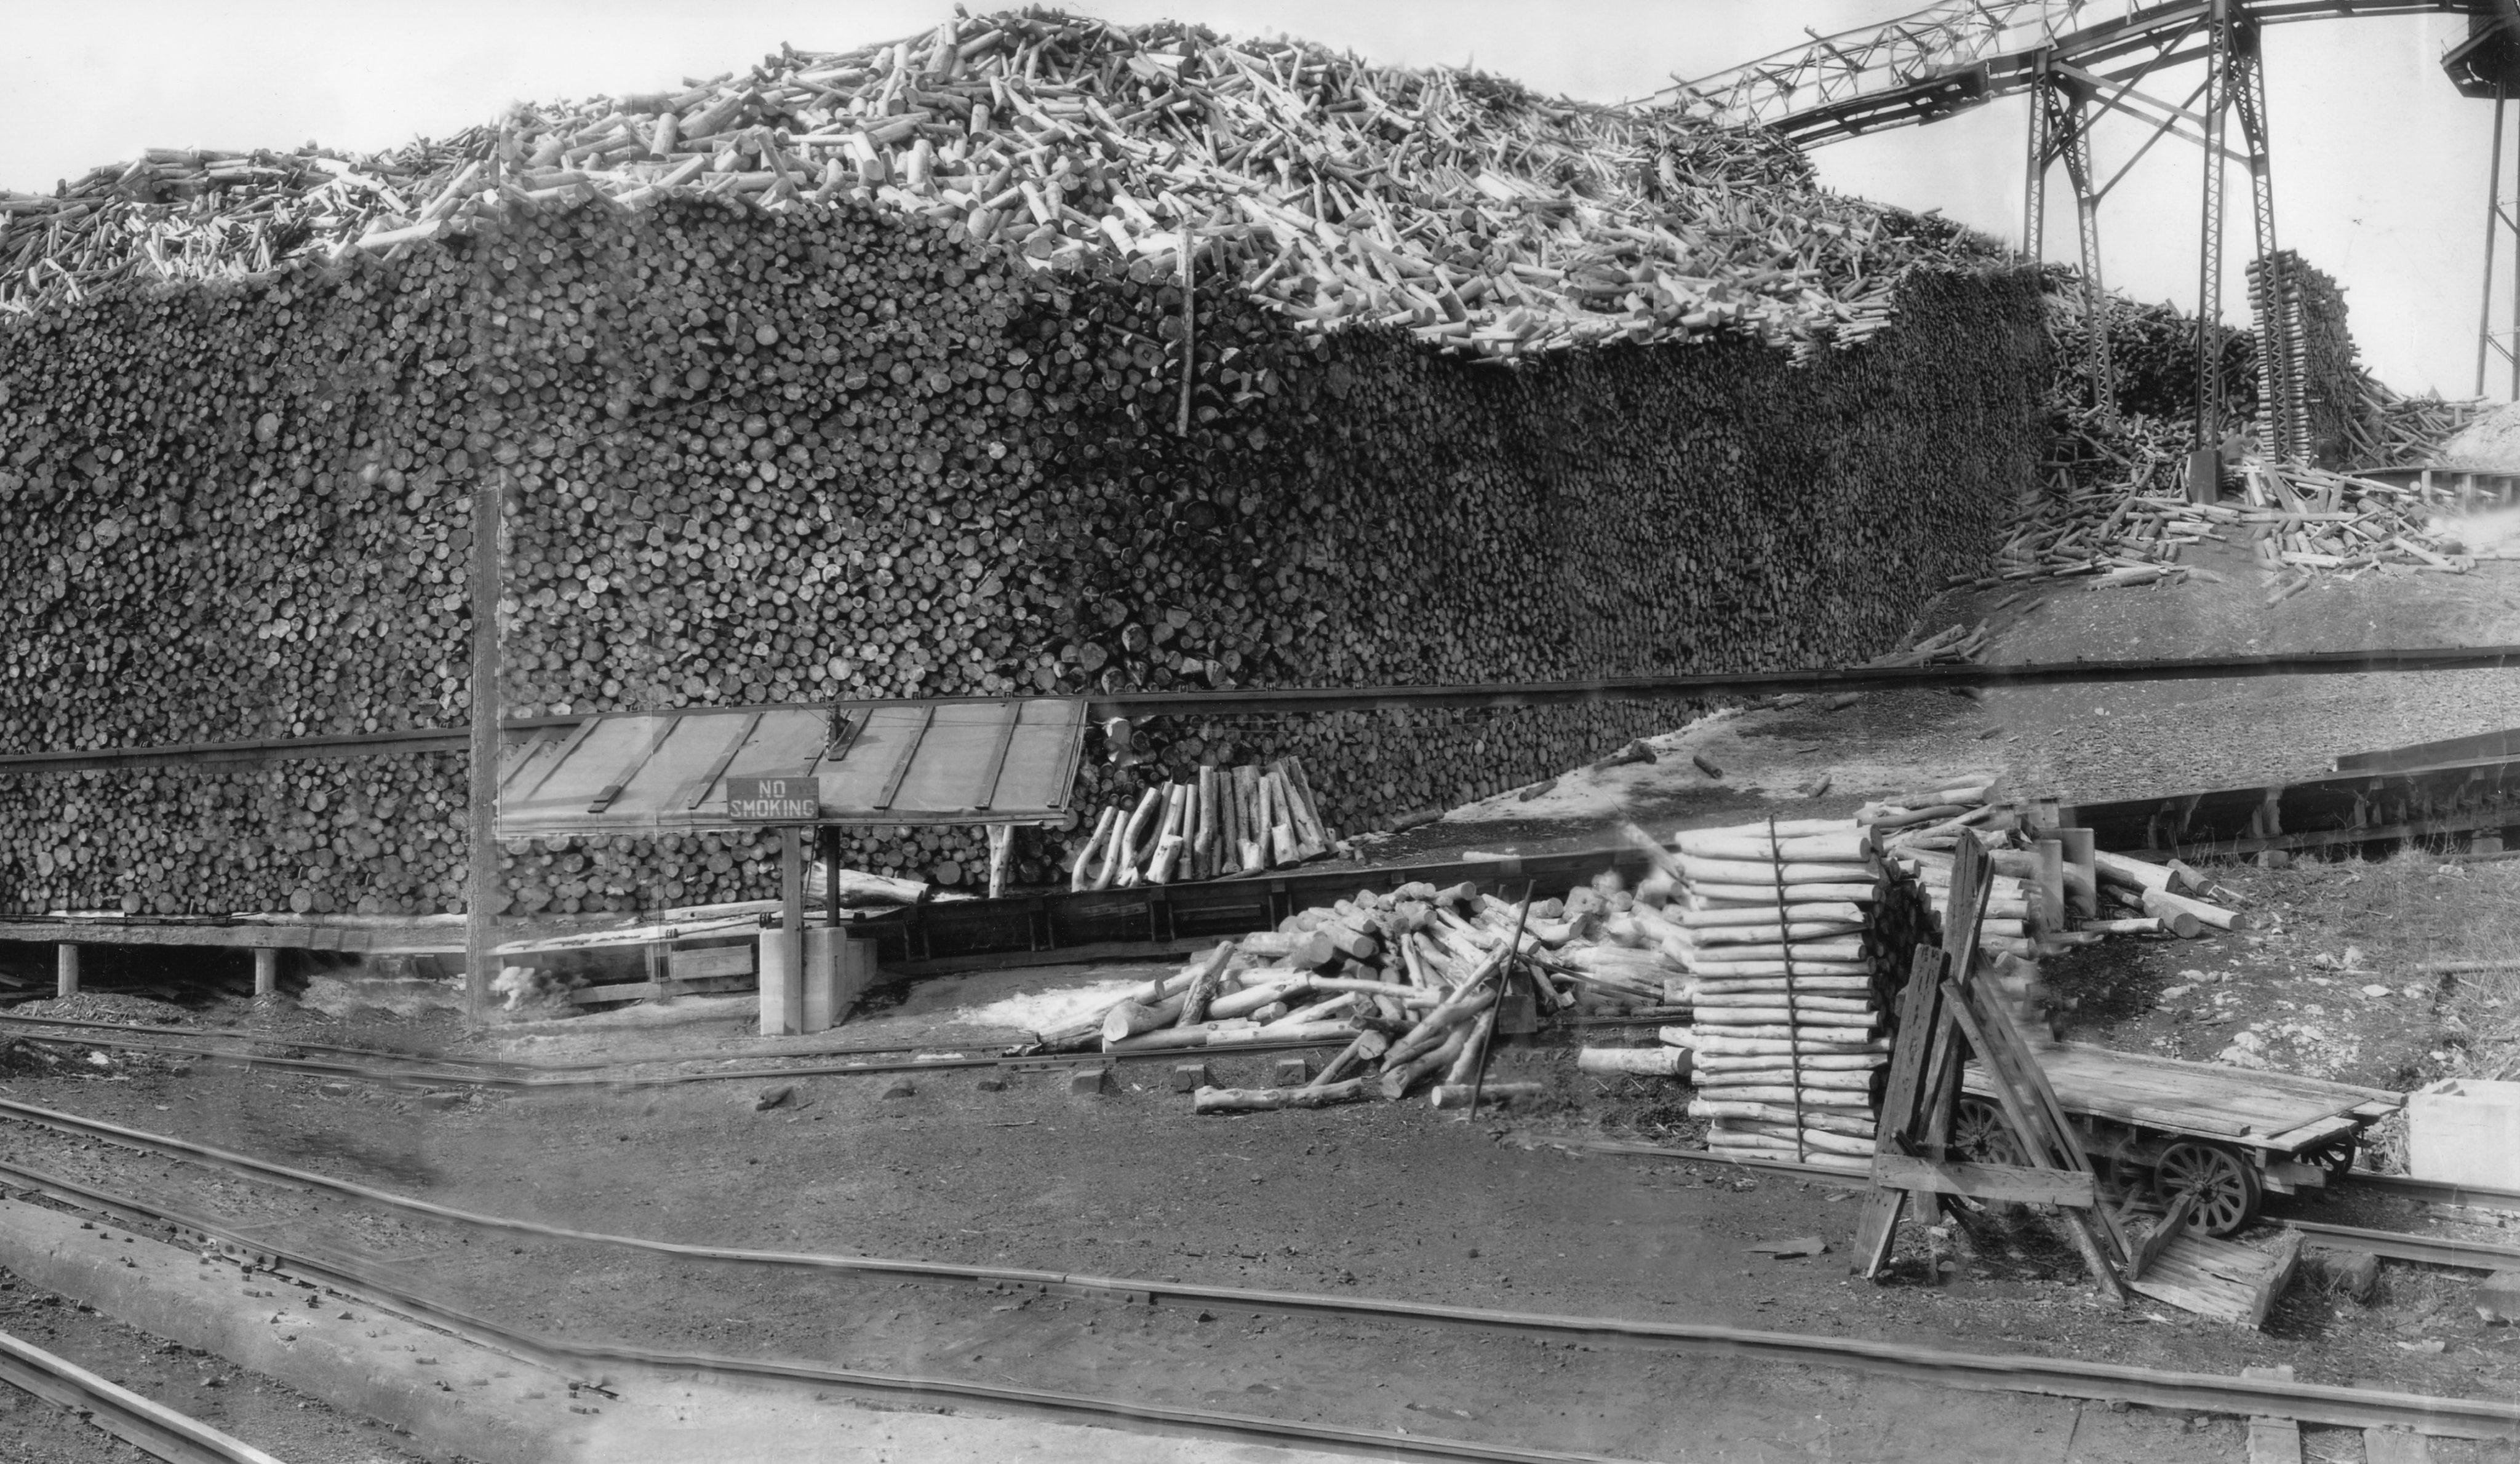 Dexter Sulfite Paper Mill In Dexter